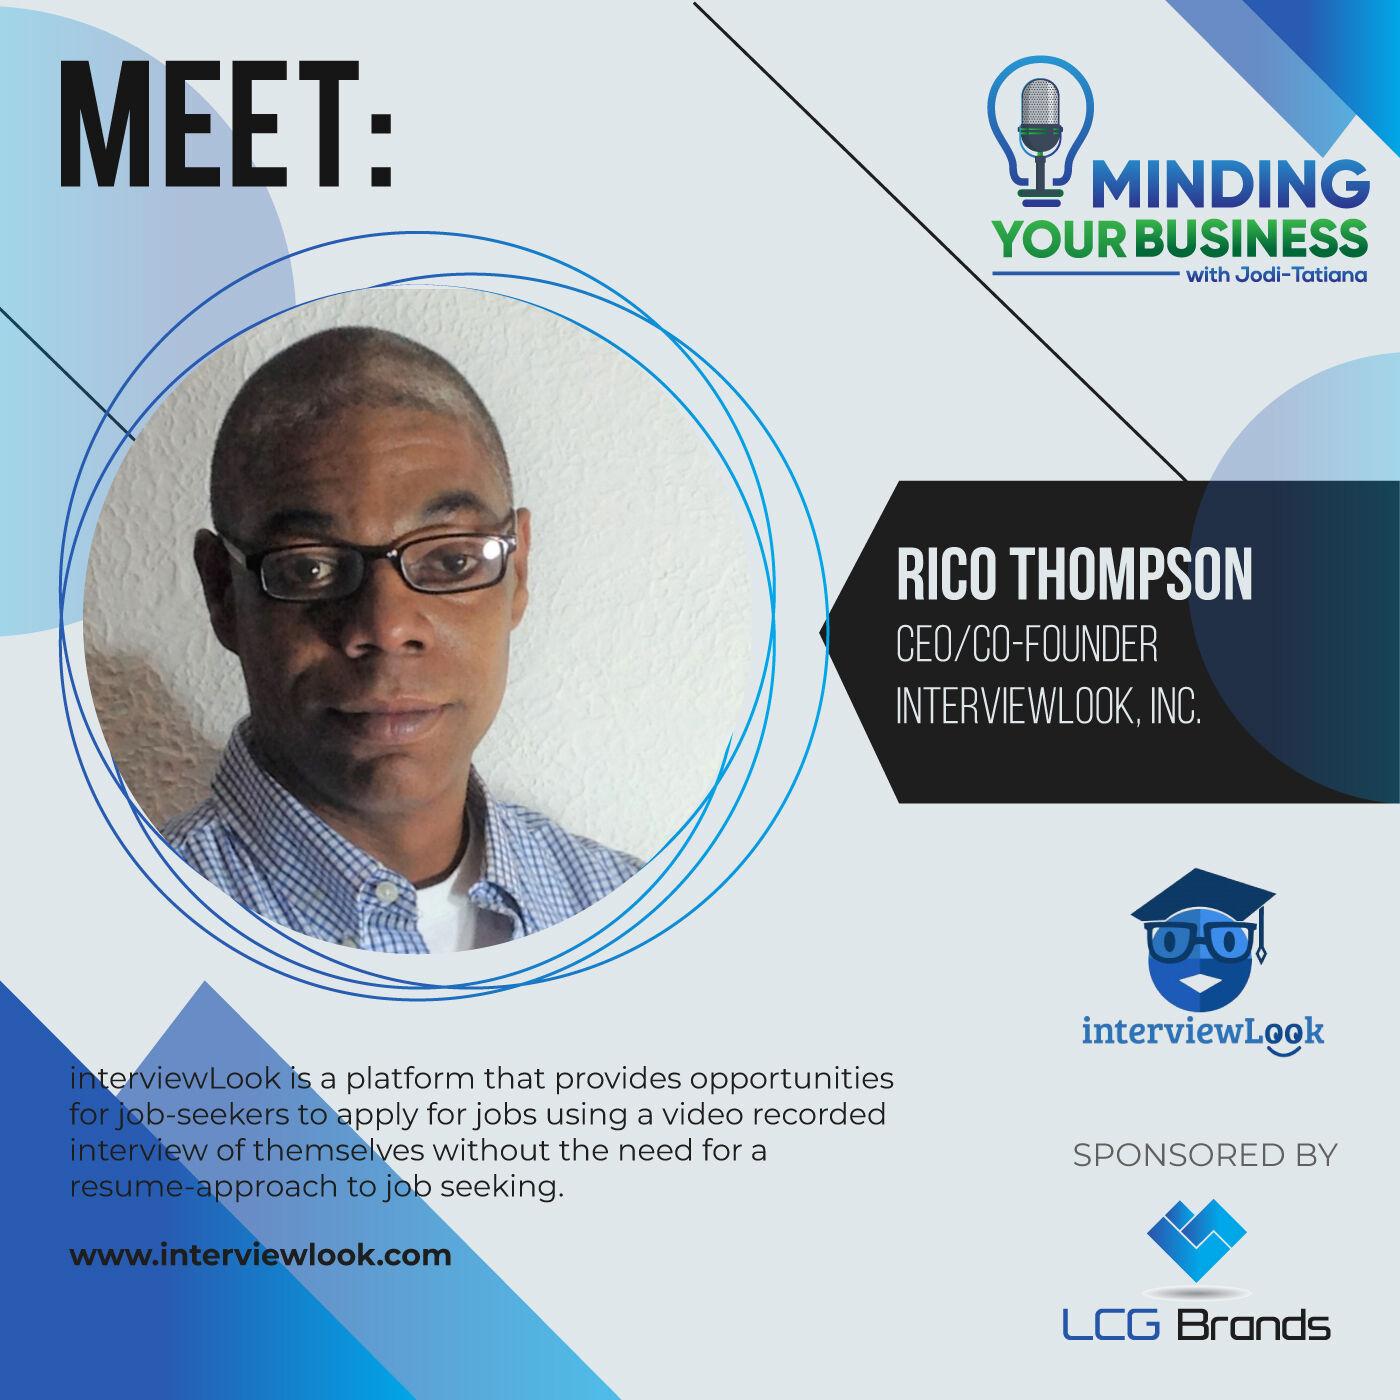 Episode 110: Meet interviewLook, Inc. ceo/founder, Rico Thompson (Ohio-USA)